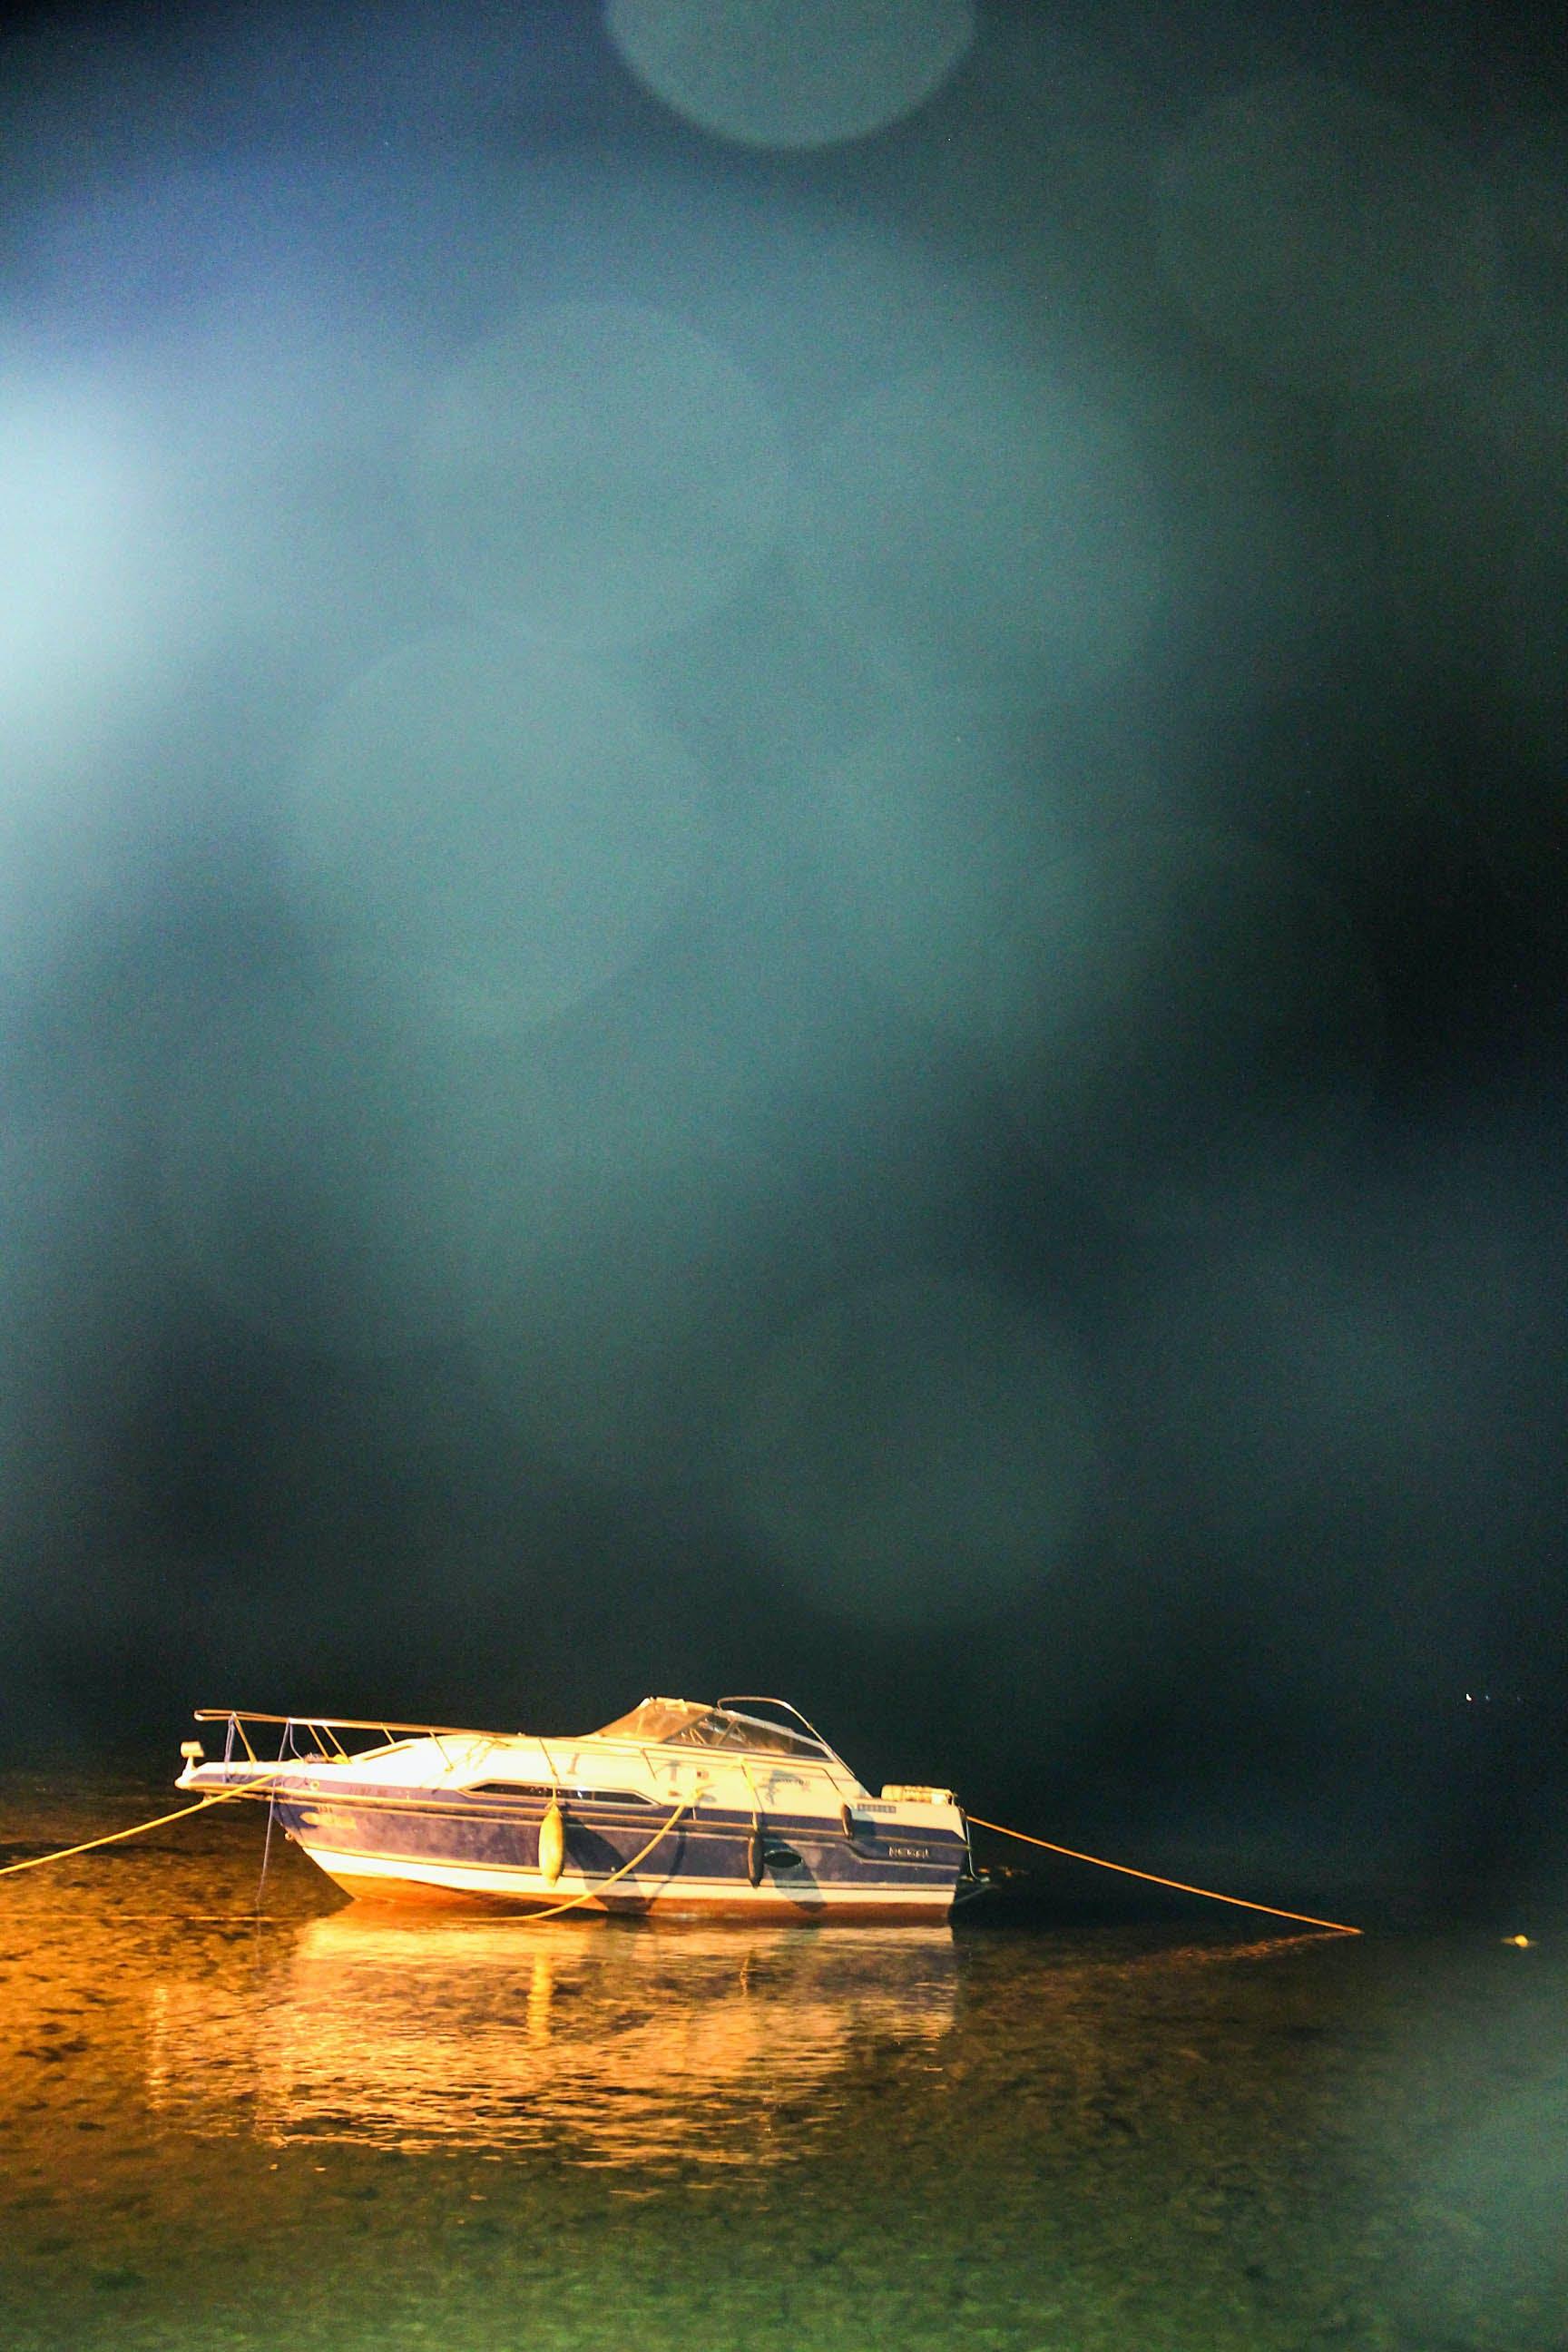 Základová fotografie zdarma na téma člun, dahab, Egypt, klidný